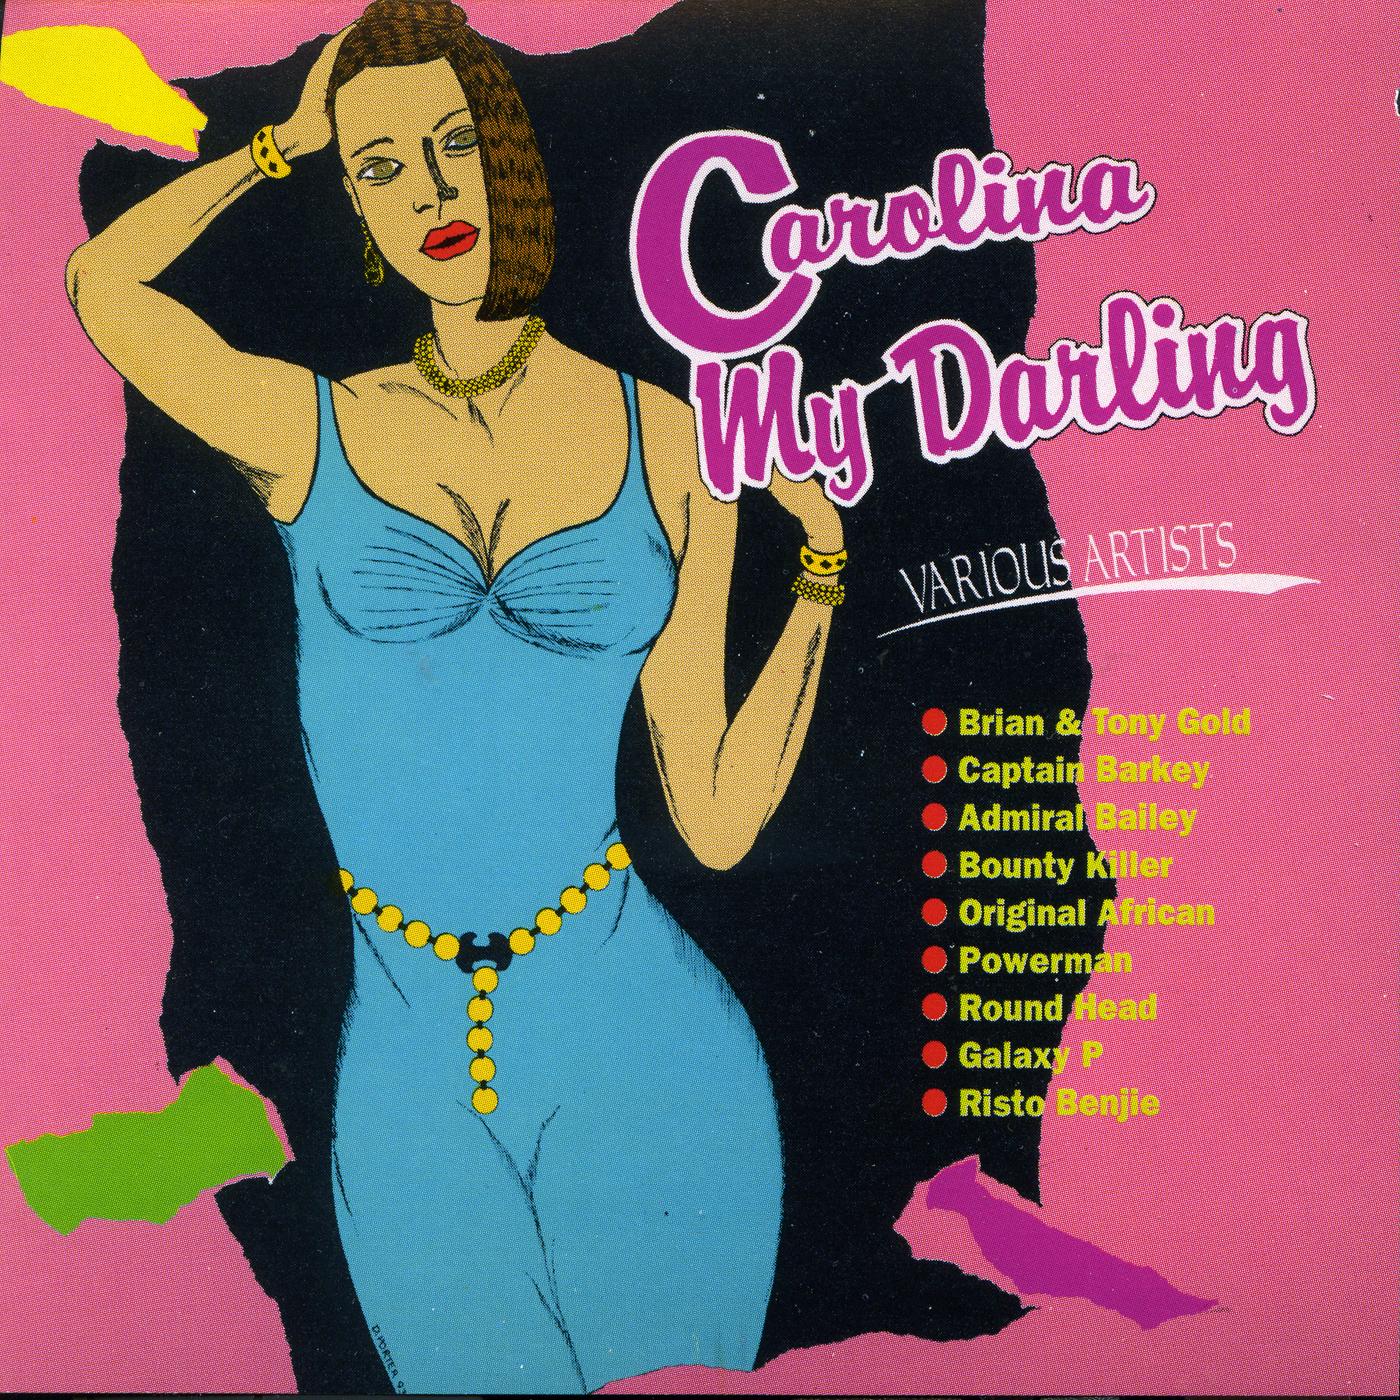 Carolina My Darling